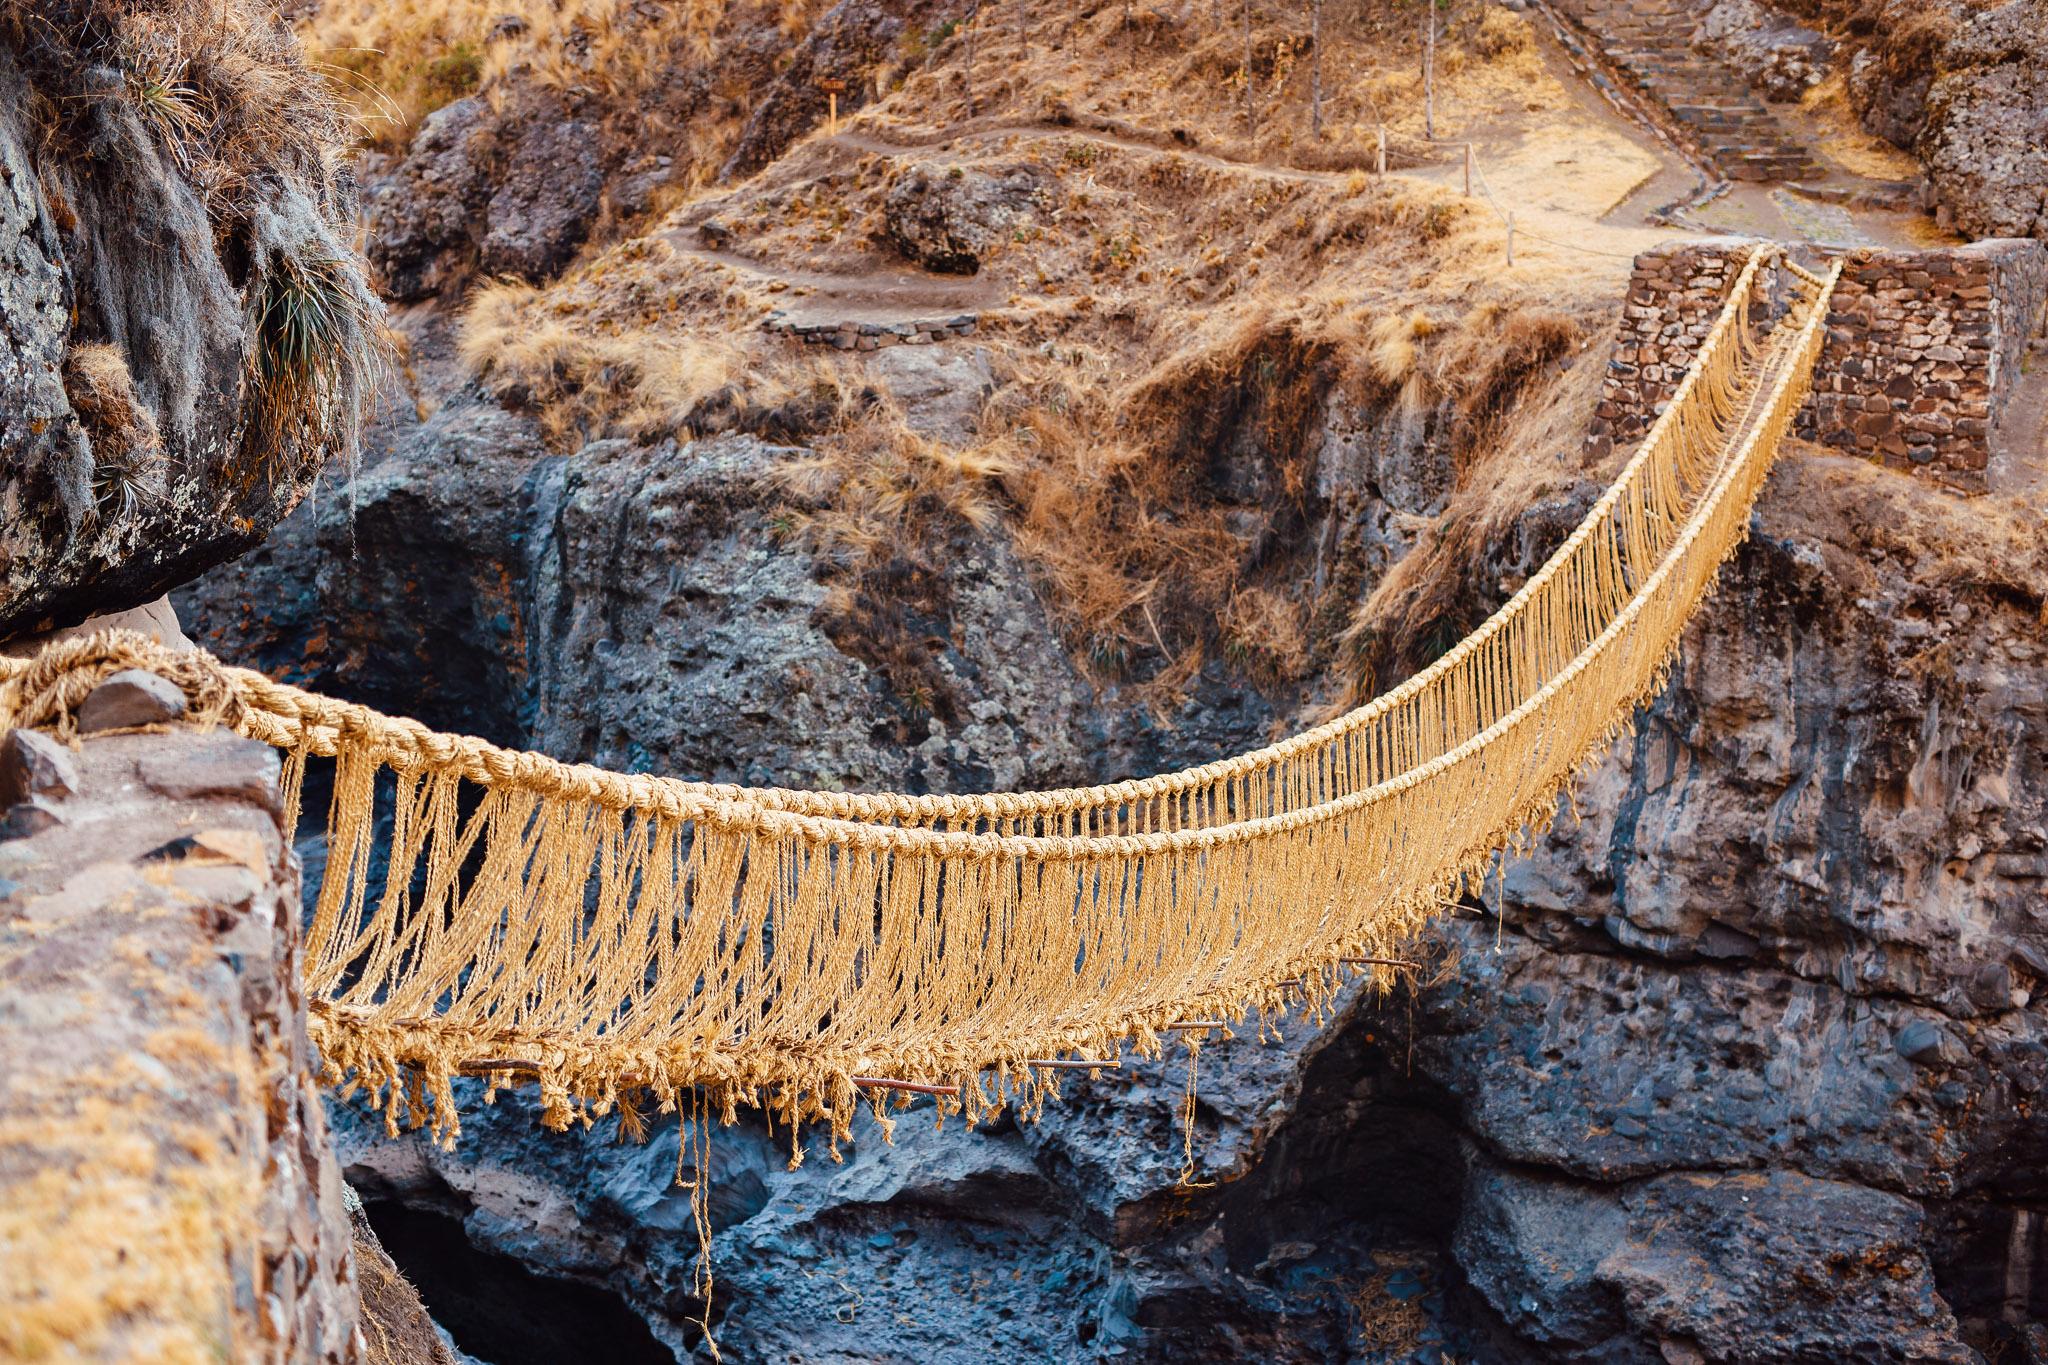 travel-photography-overlanding-apurimac-valley-peru-queswachaka-last-inca-bridge-9.jpg